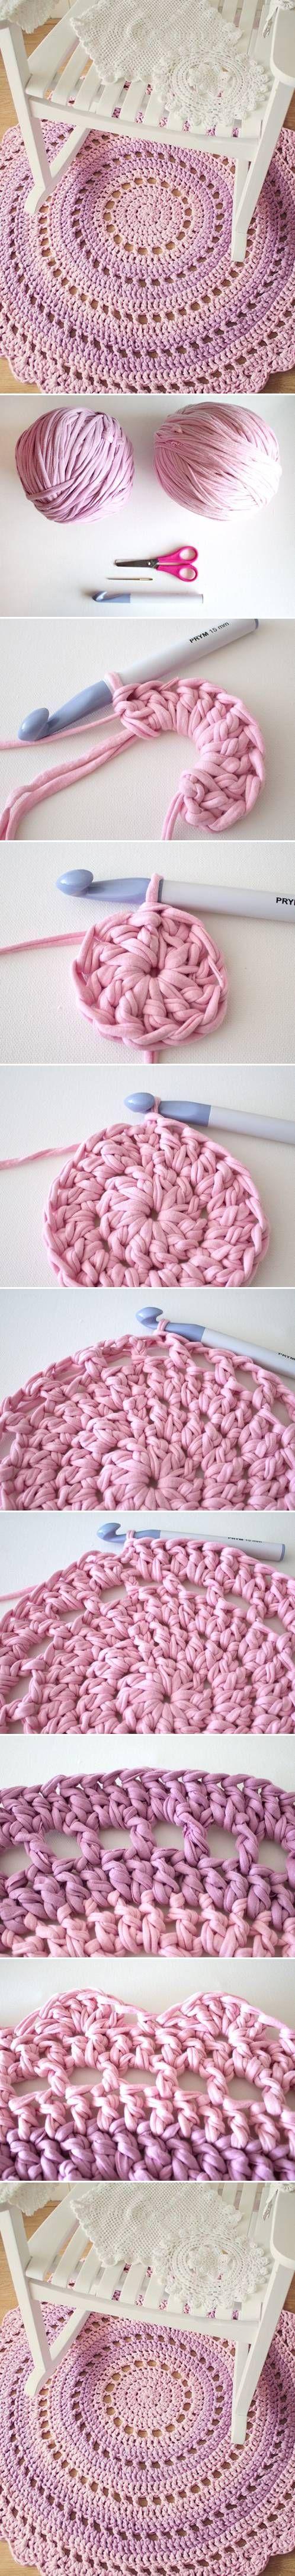 DIY Knitted Mandala Rug